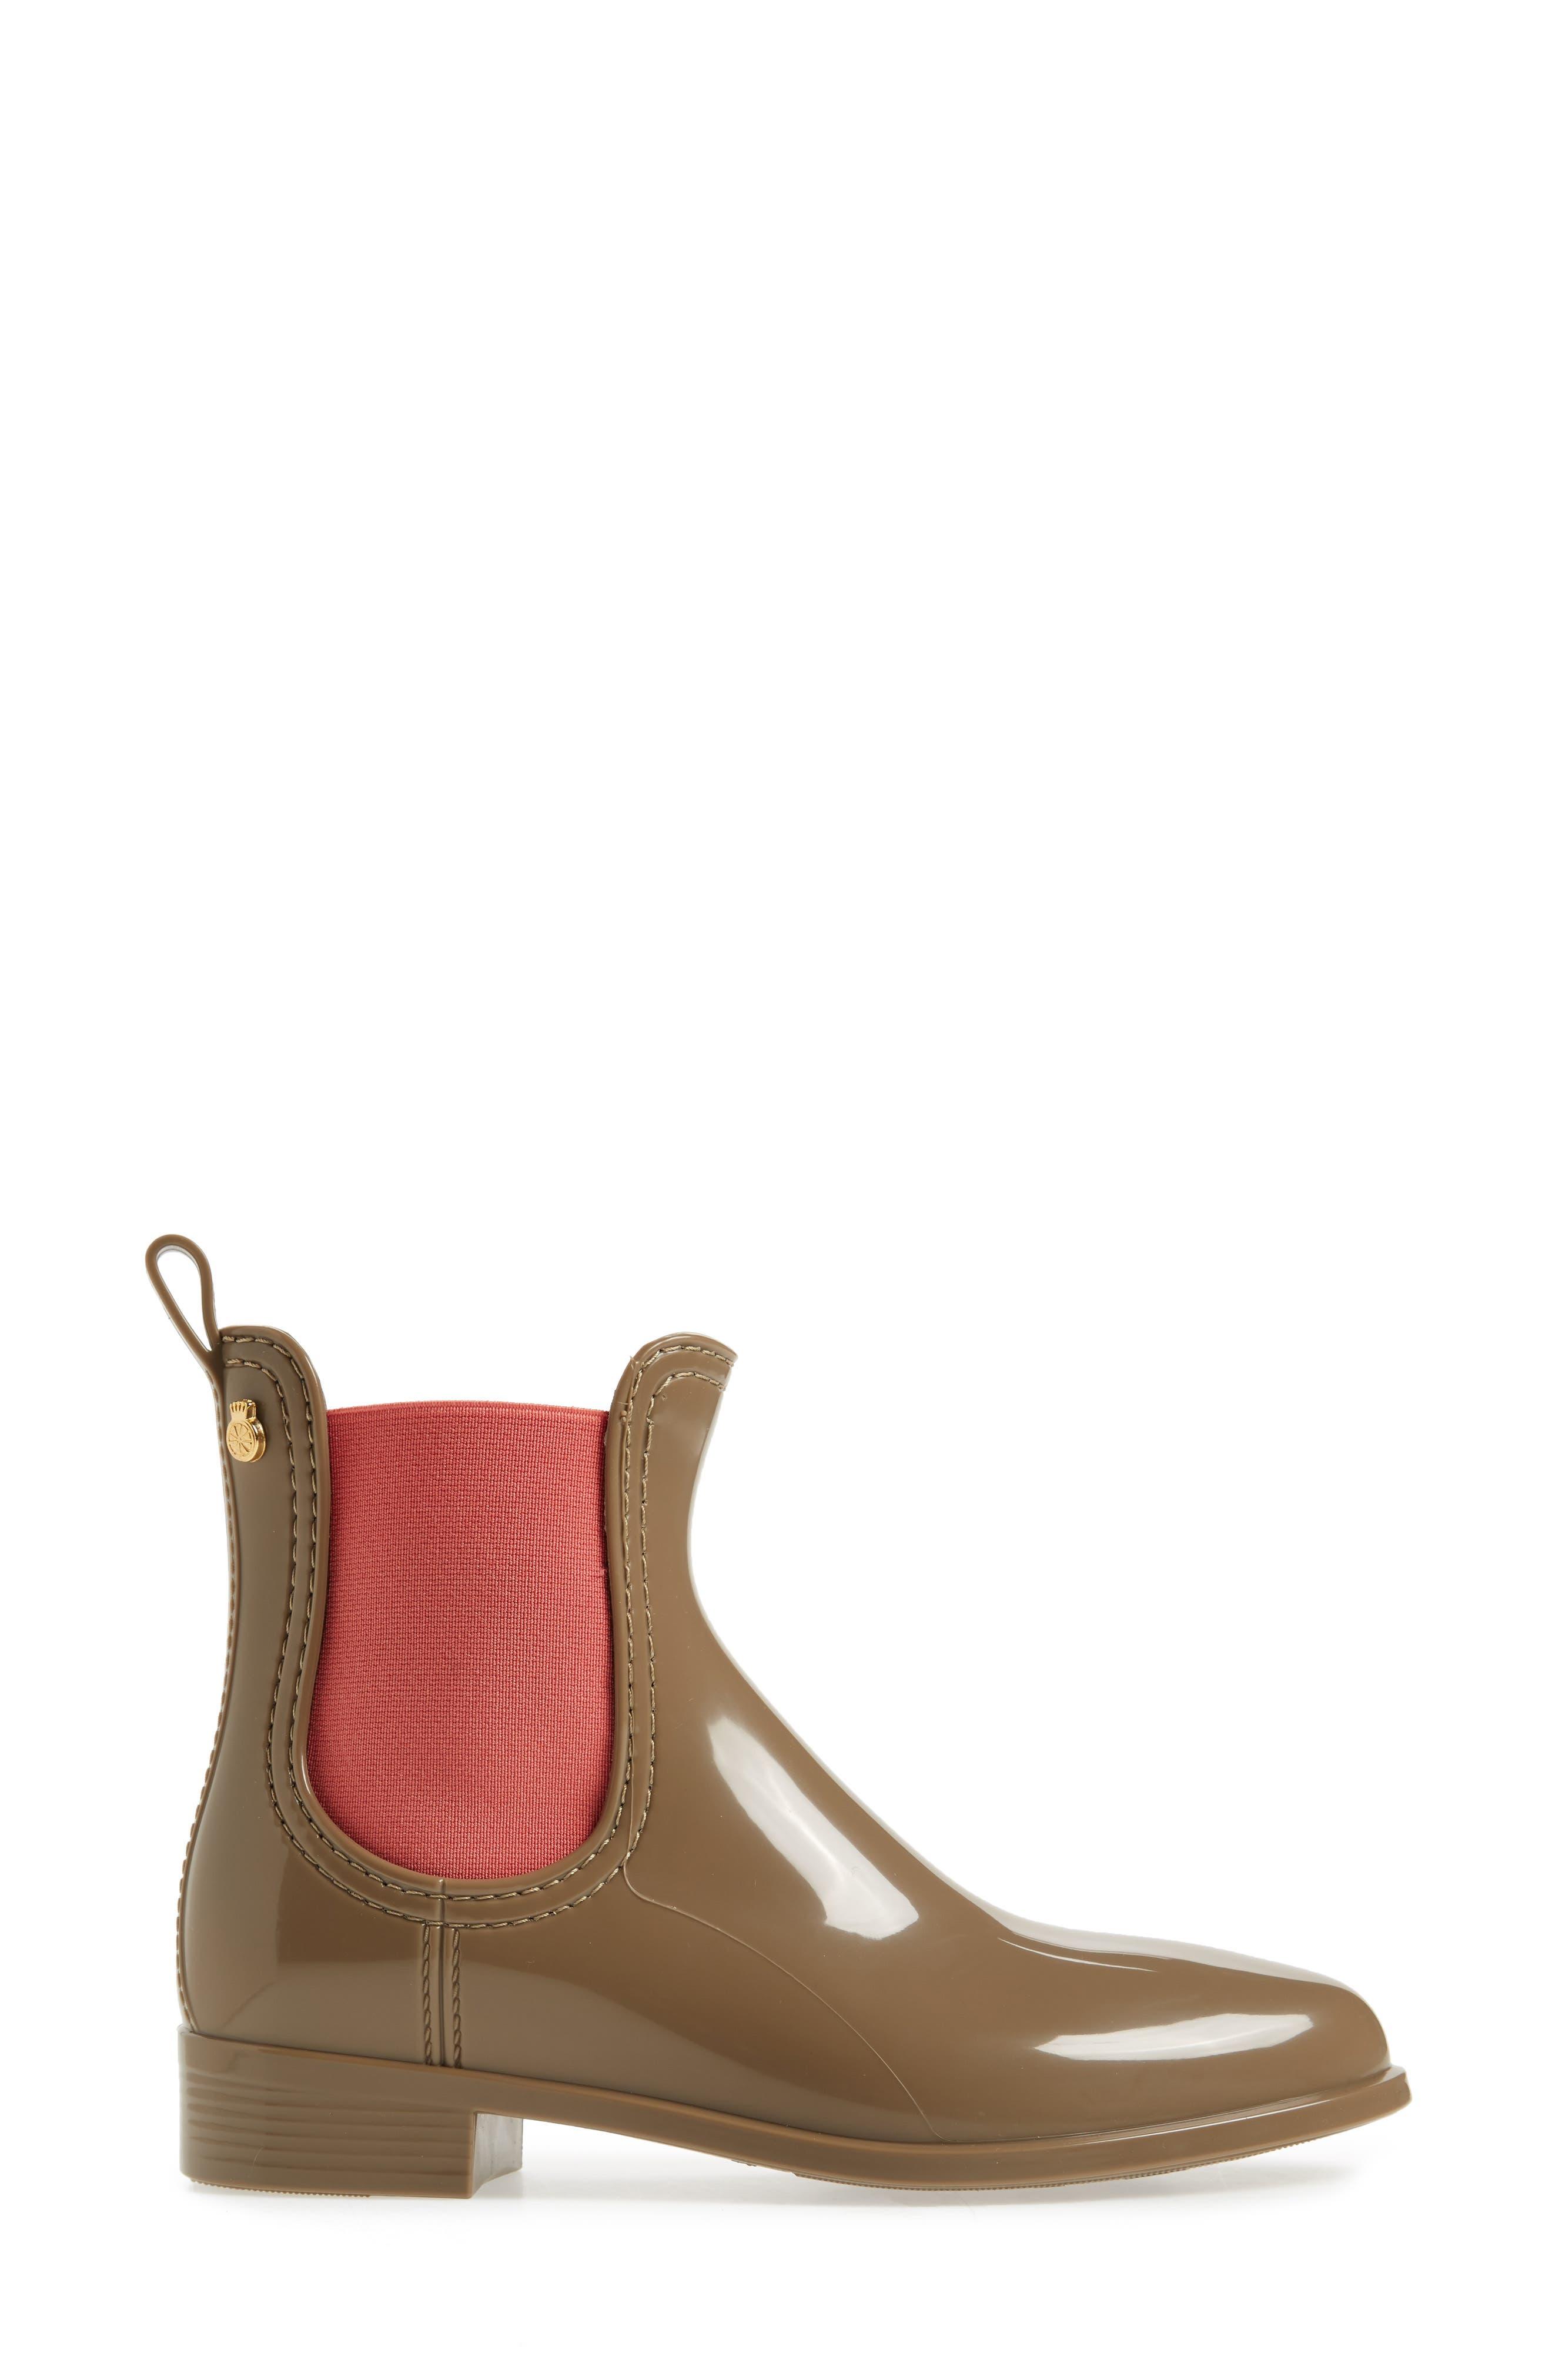 Pisa Waterproof Chelsea Boot,                             Alternate thumbnail 3, color,                             Taupe Gloss